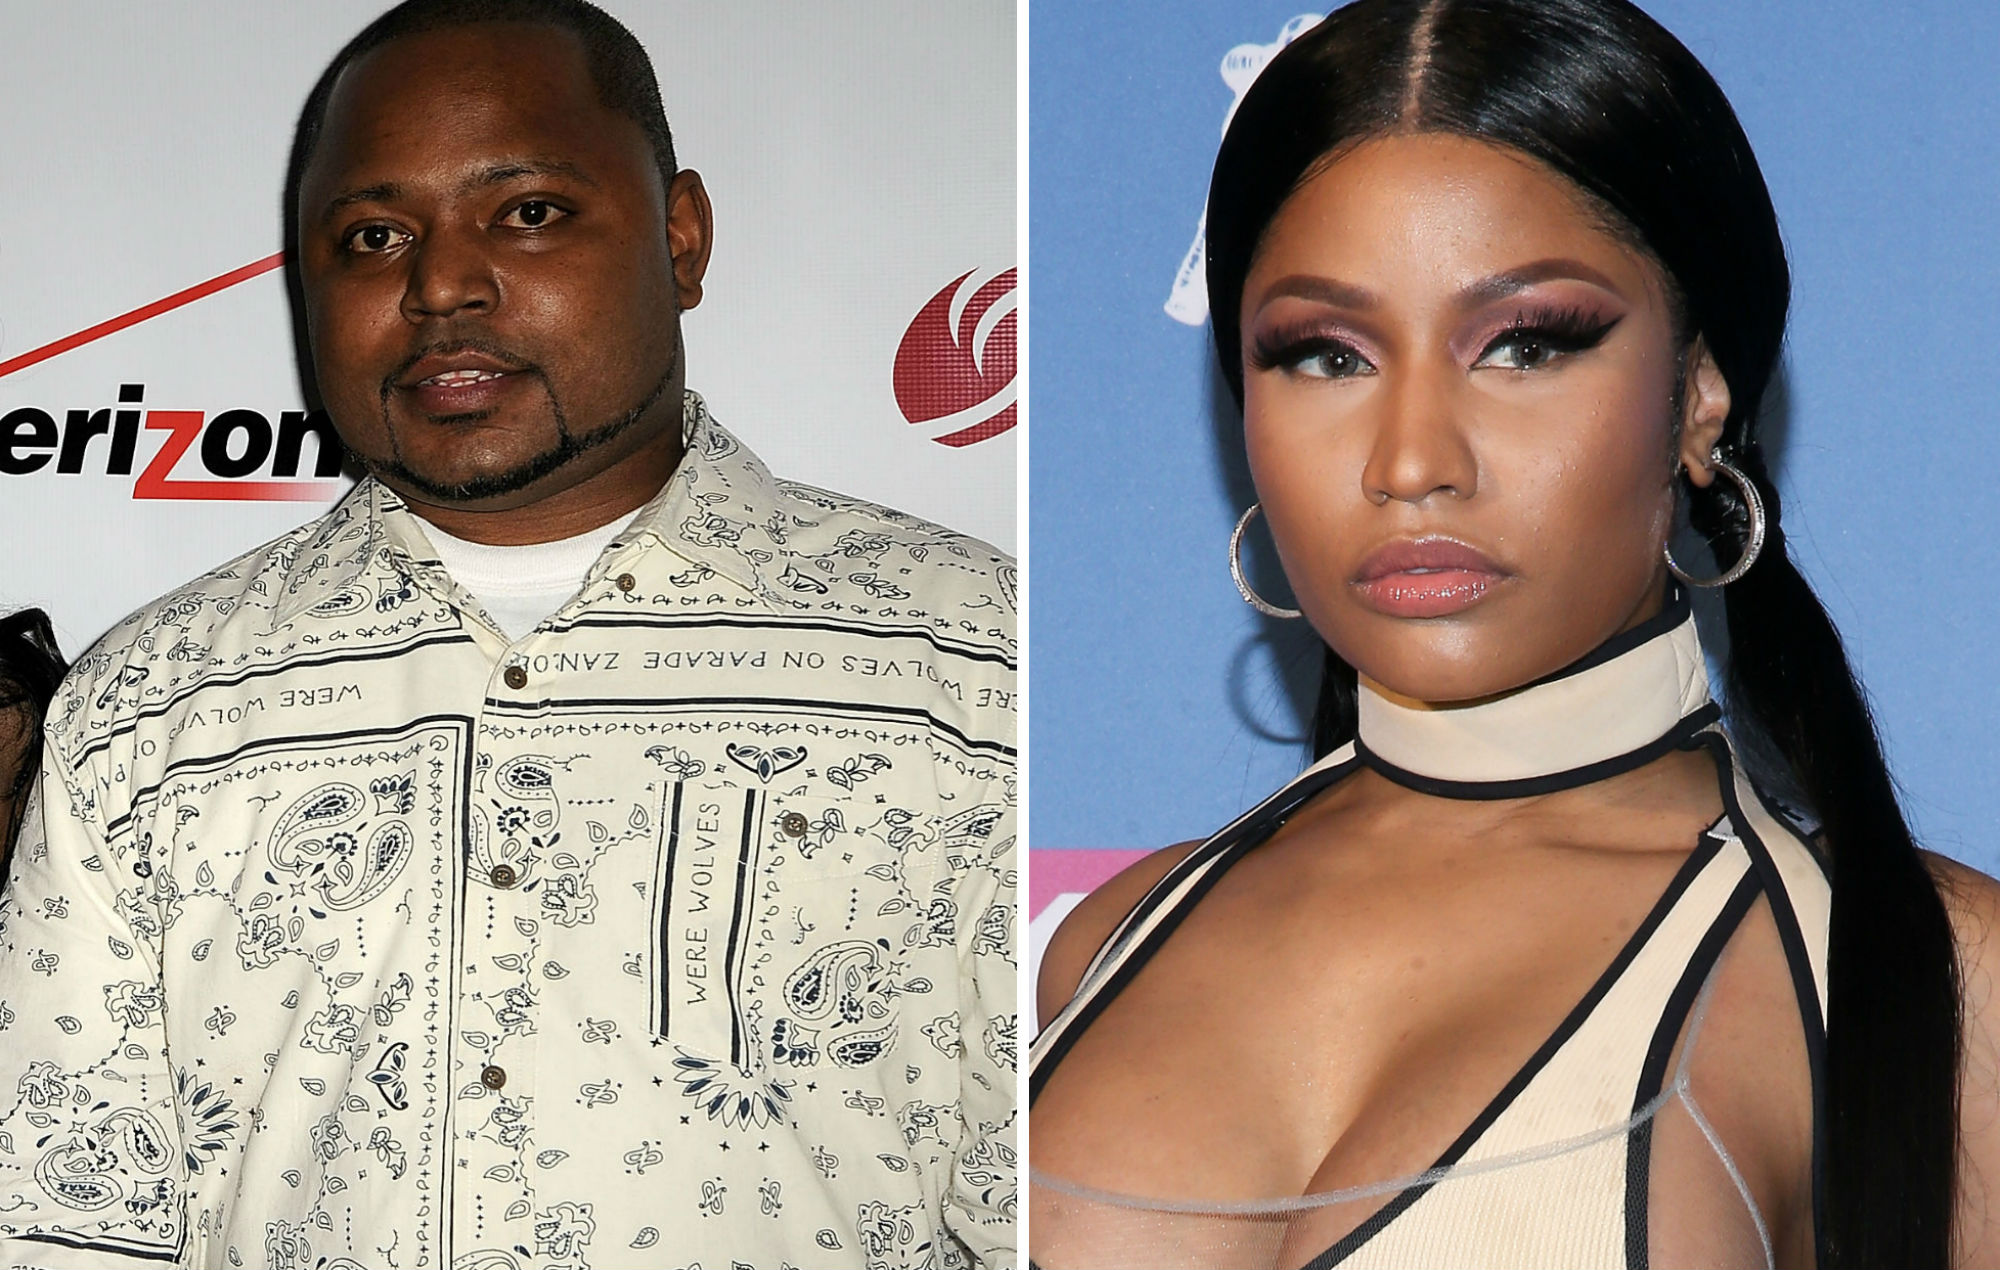 Nicki Minaj's brother jailed for raping 11-year-old girl